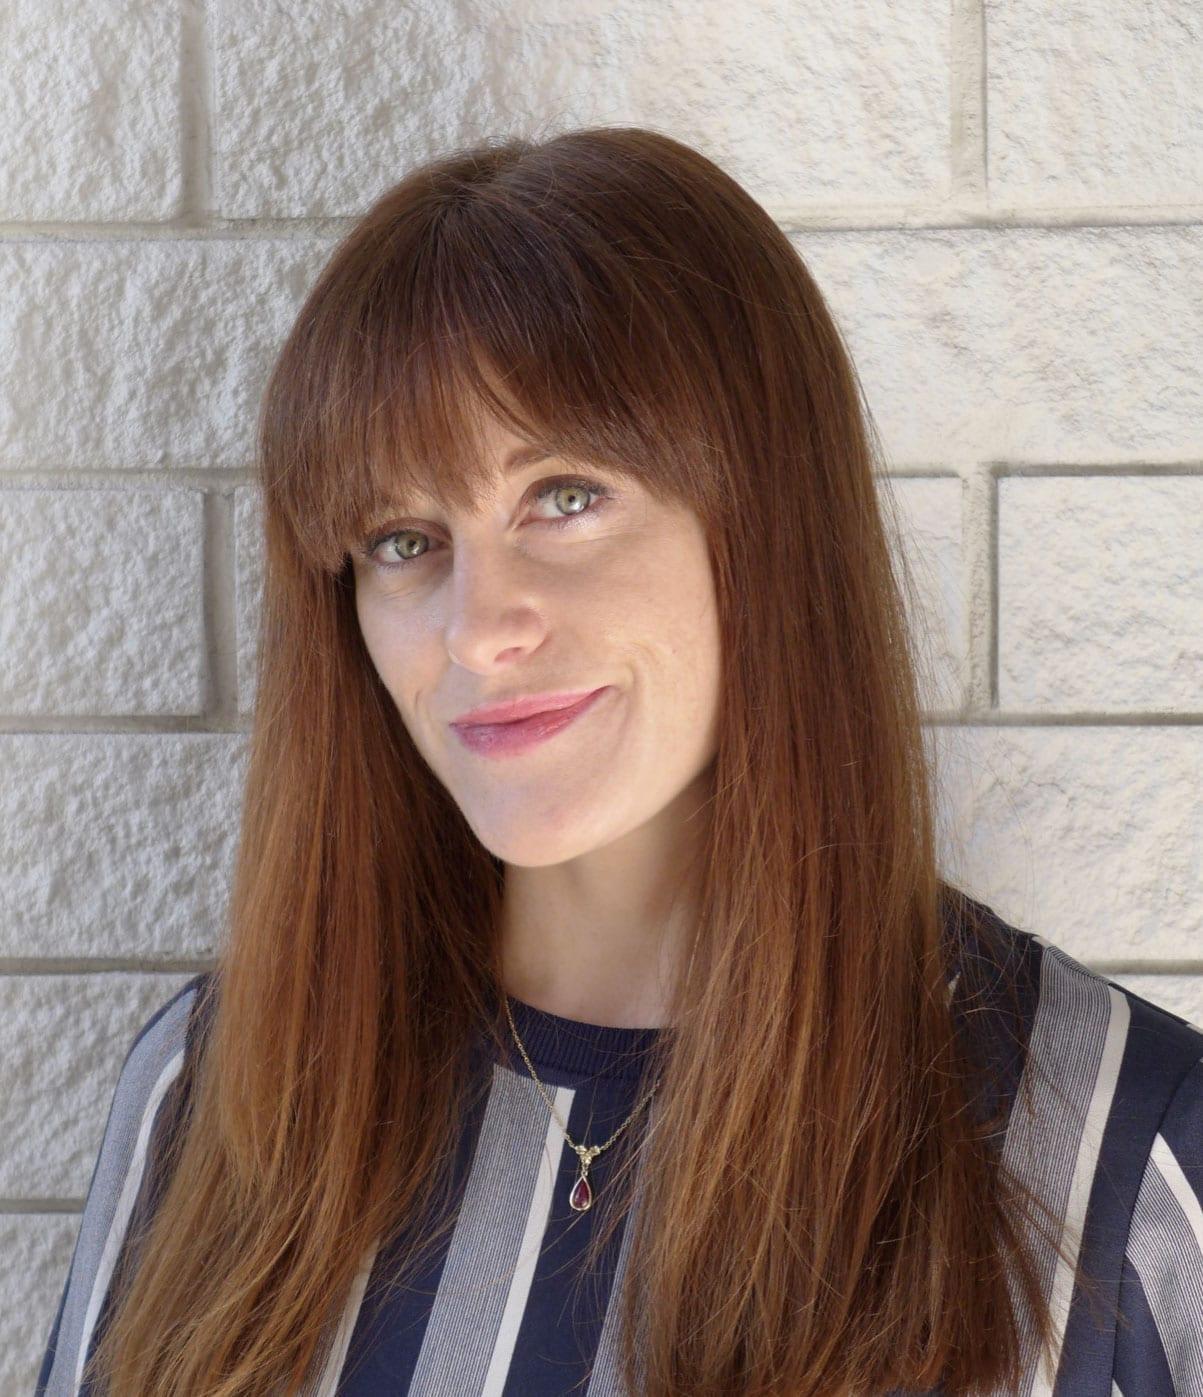 Image of branding designer and graphic designer Jessica Croome of Perth WA